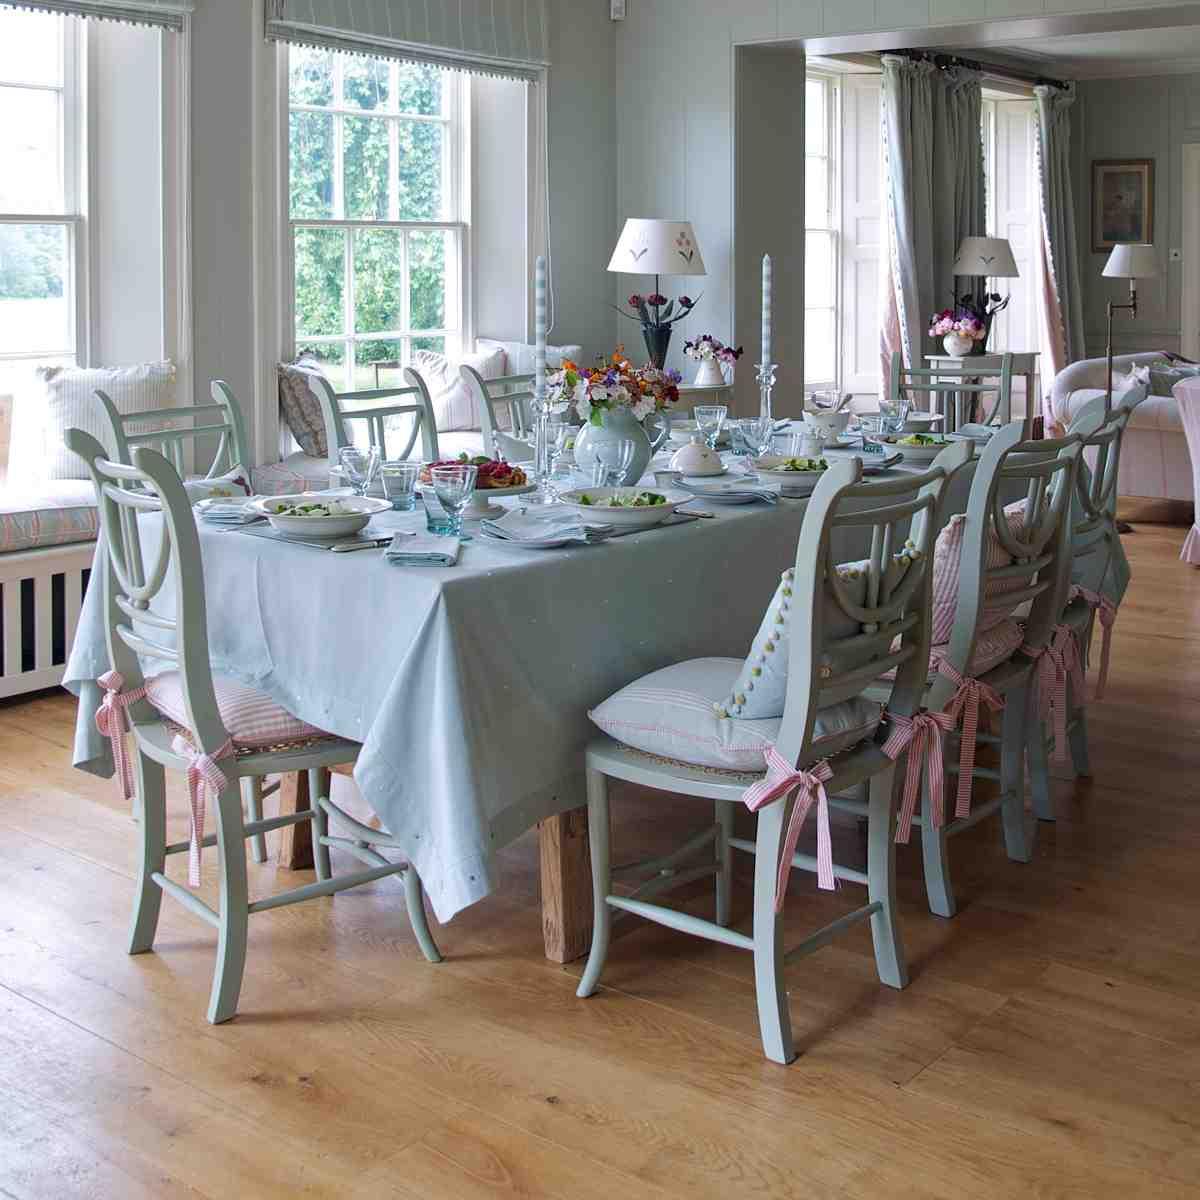 Kitchen Chair Seat Cushions  Home Furniture Design